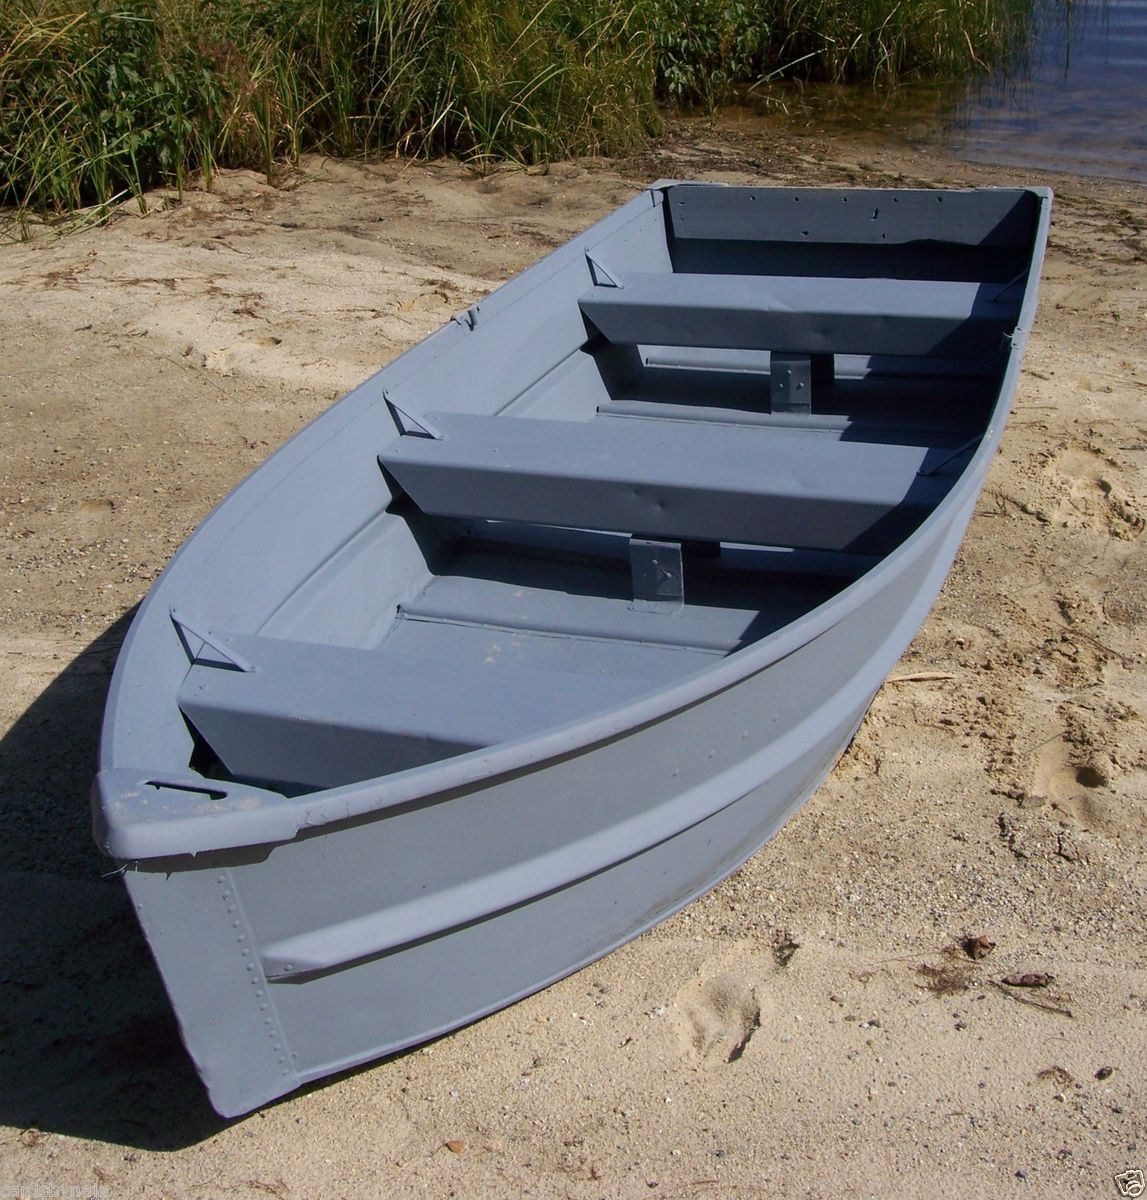 Used 11 5 aluminum jon boat fishing car top v shape for Best aluminum fishing boats